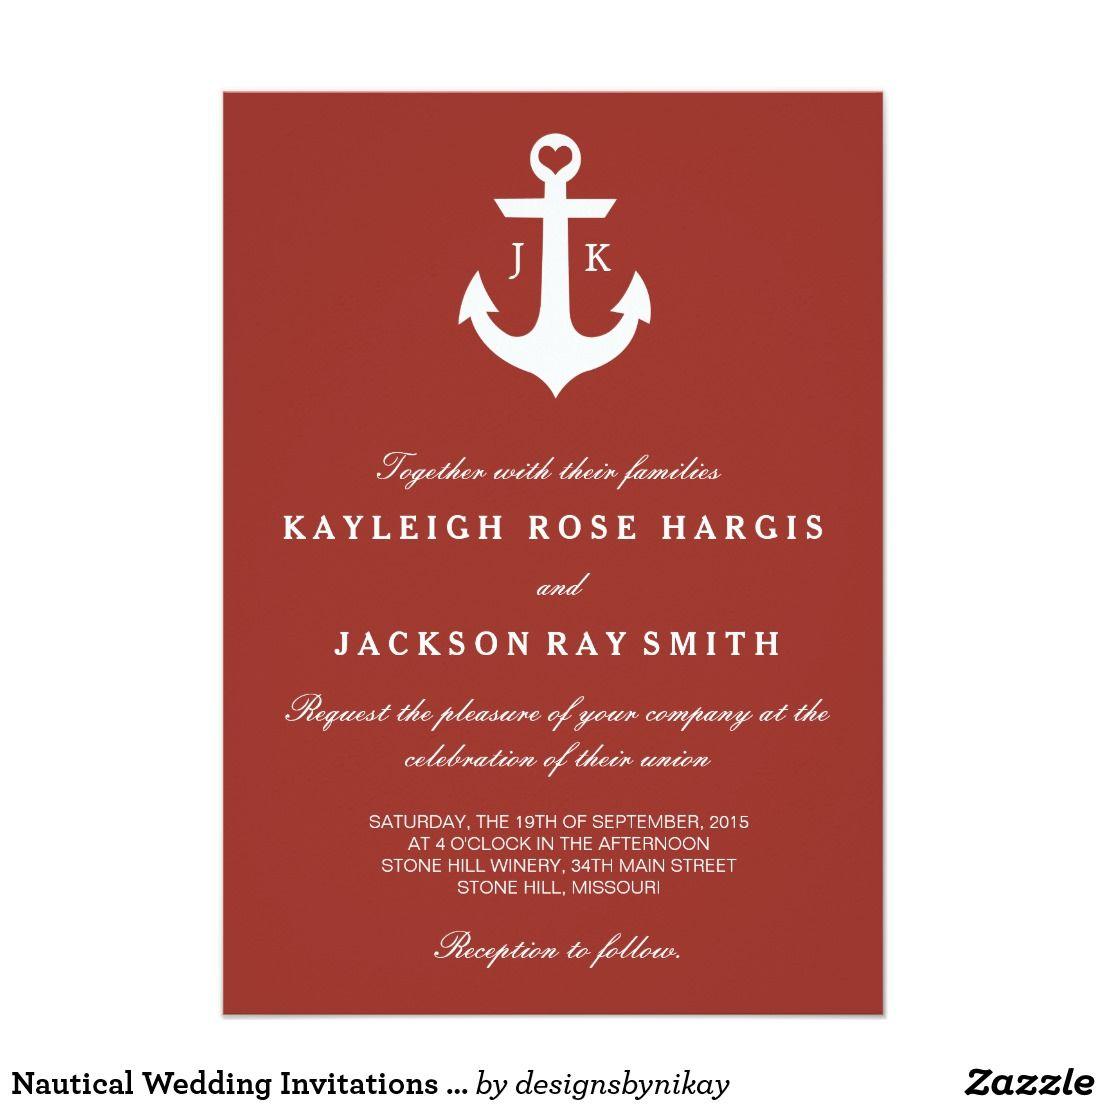 Nautical Wedding Invitations | Wedding | Pinterest | Nautical ...